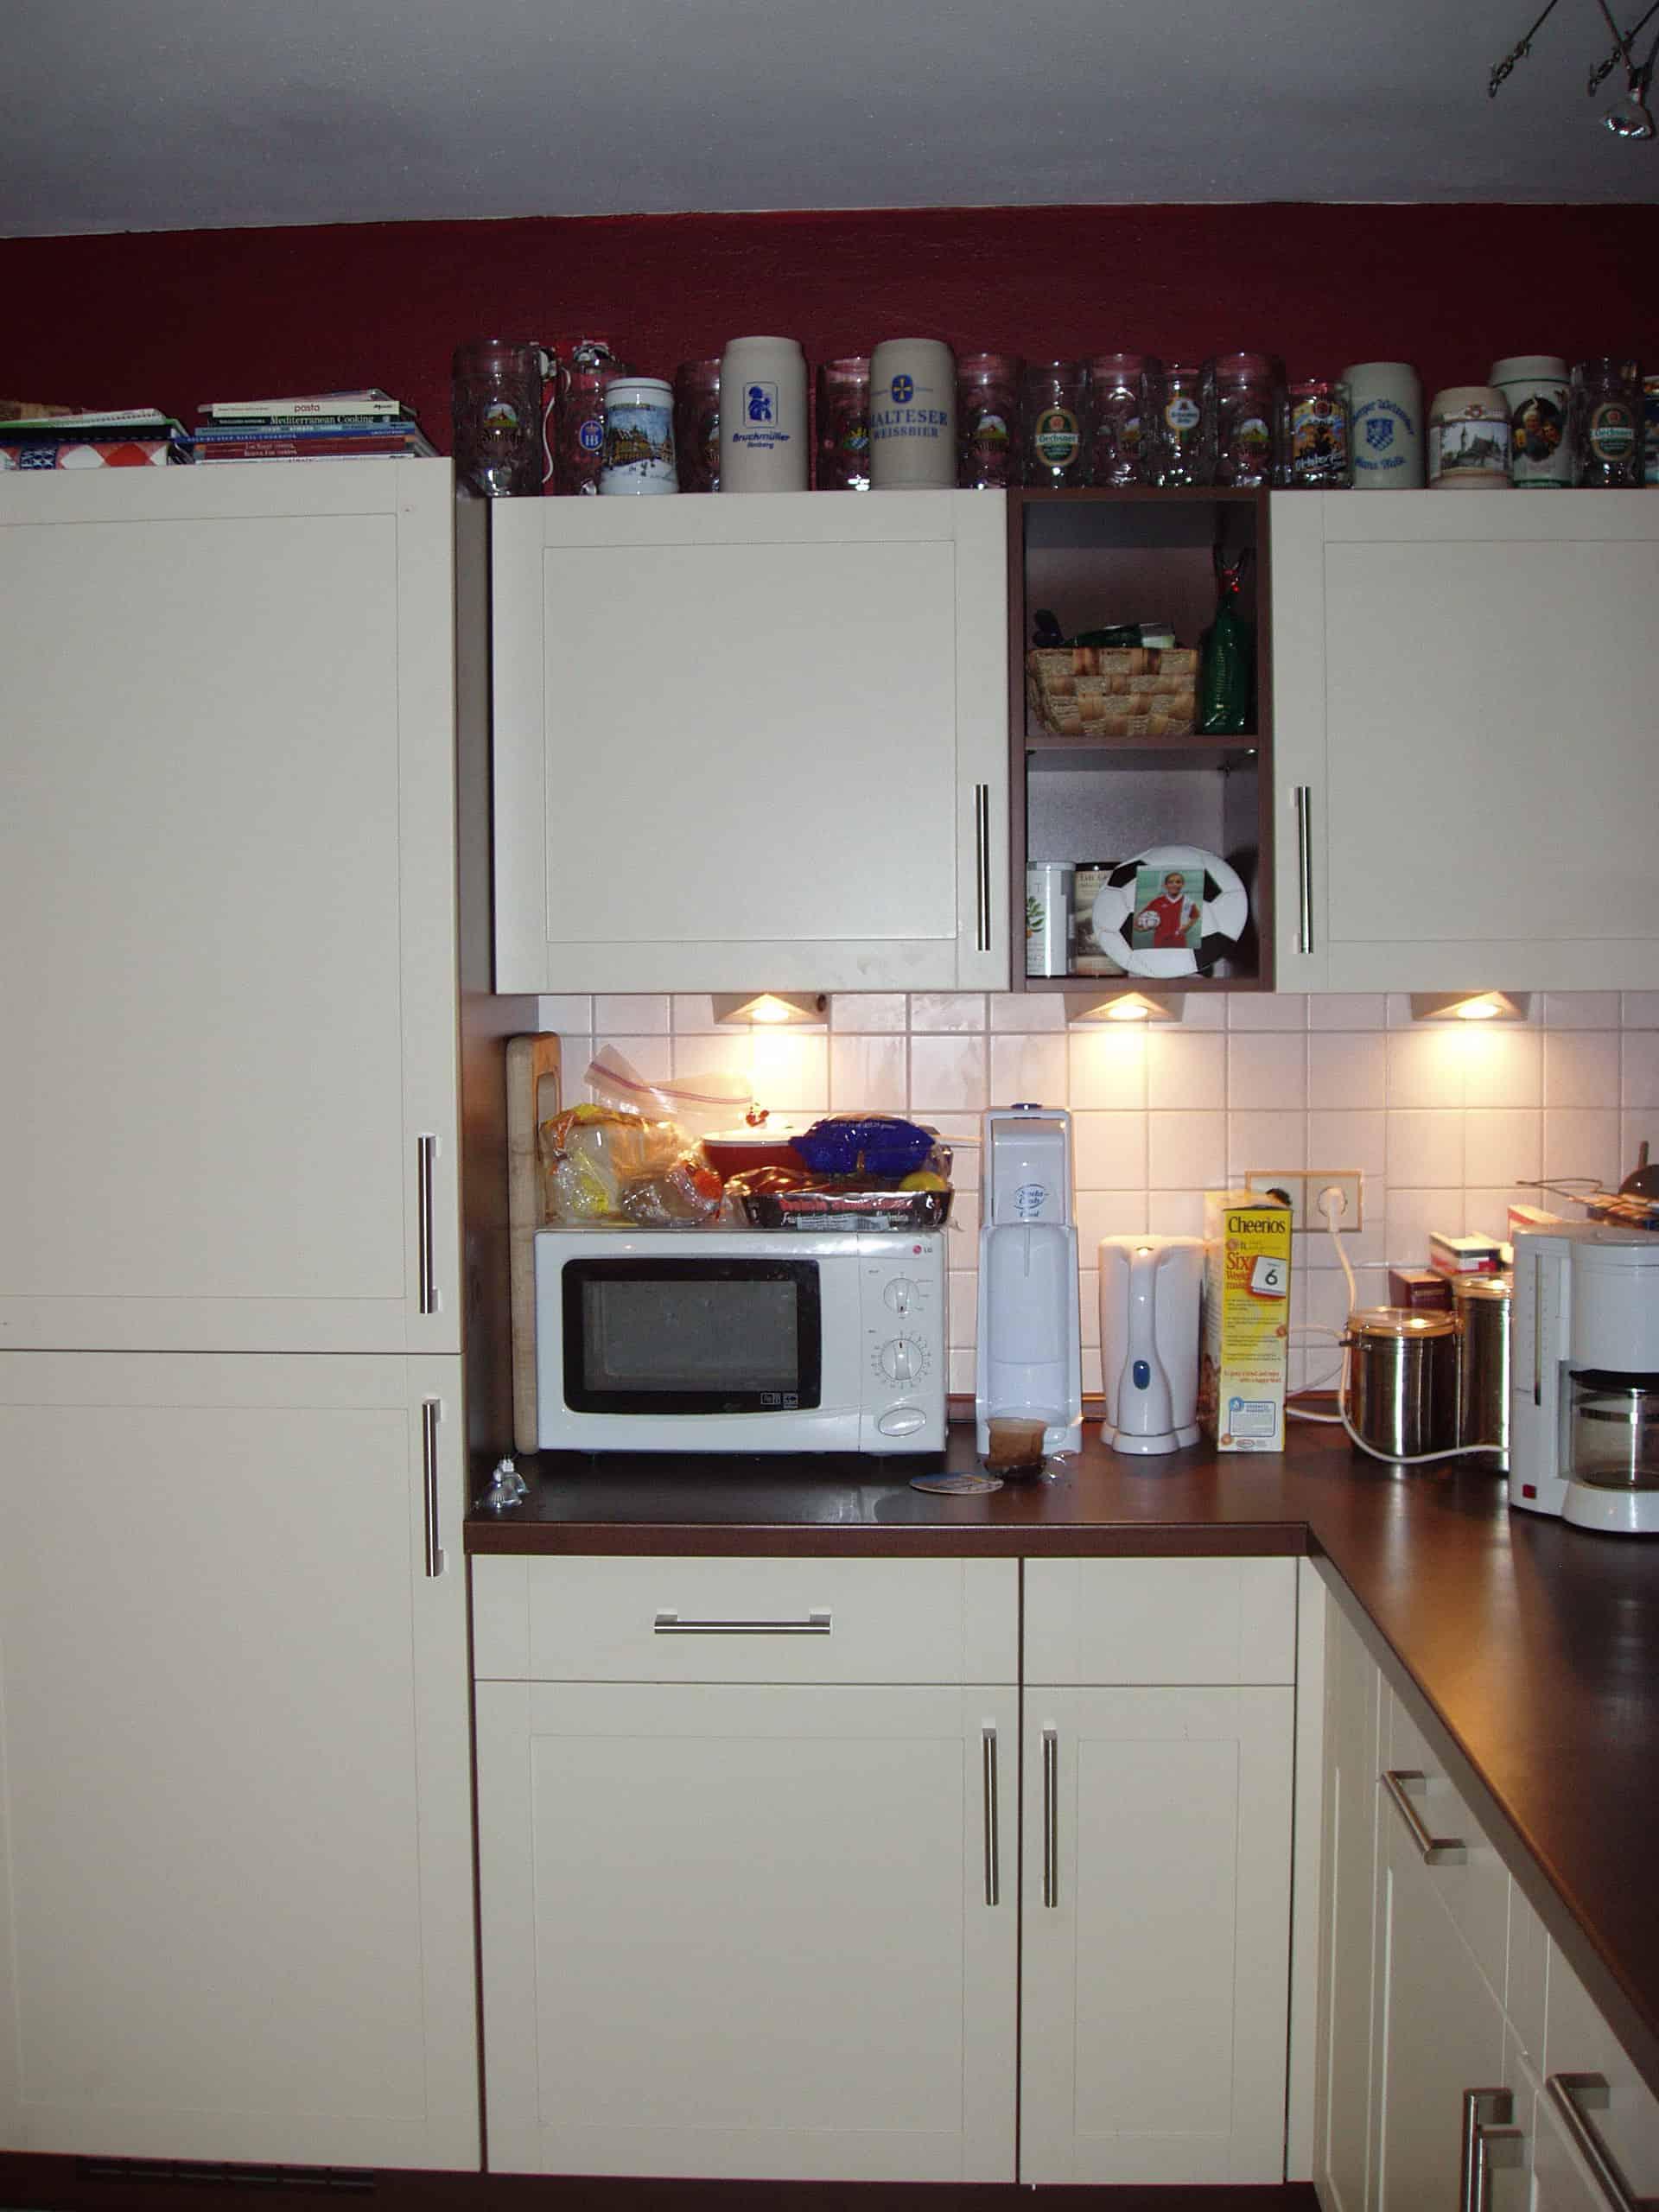 german kitchen cabinets zephyr hurricane ak2500 hood the oddity of kitchens